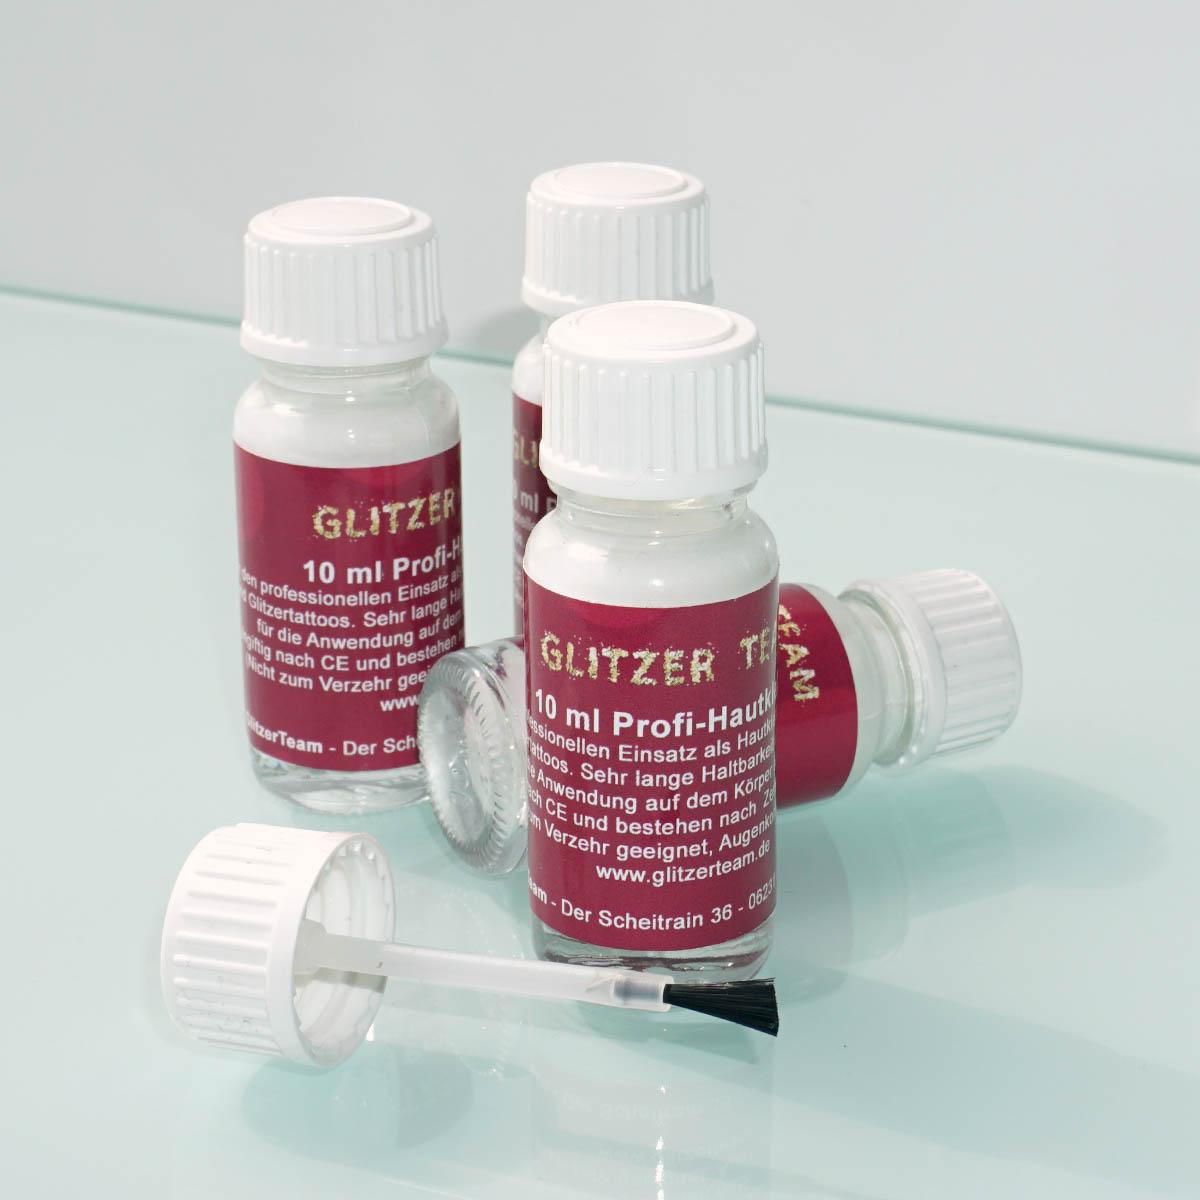 "Hautkleber ""Glitzer Team"" Professionell speziell für Glitzer Tattoo´s - 10ml"